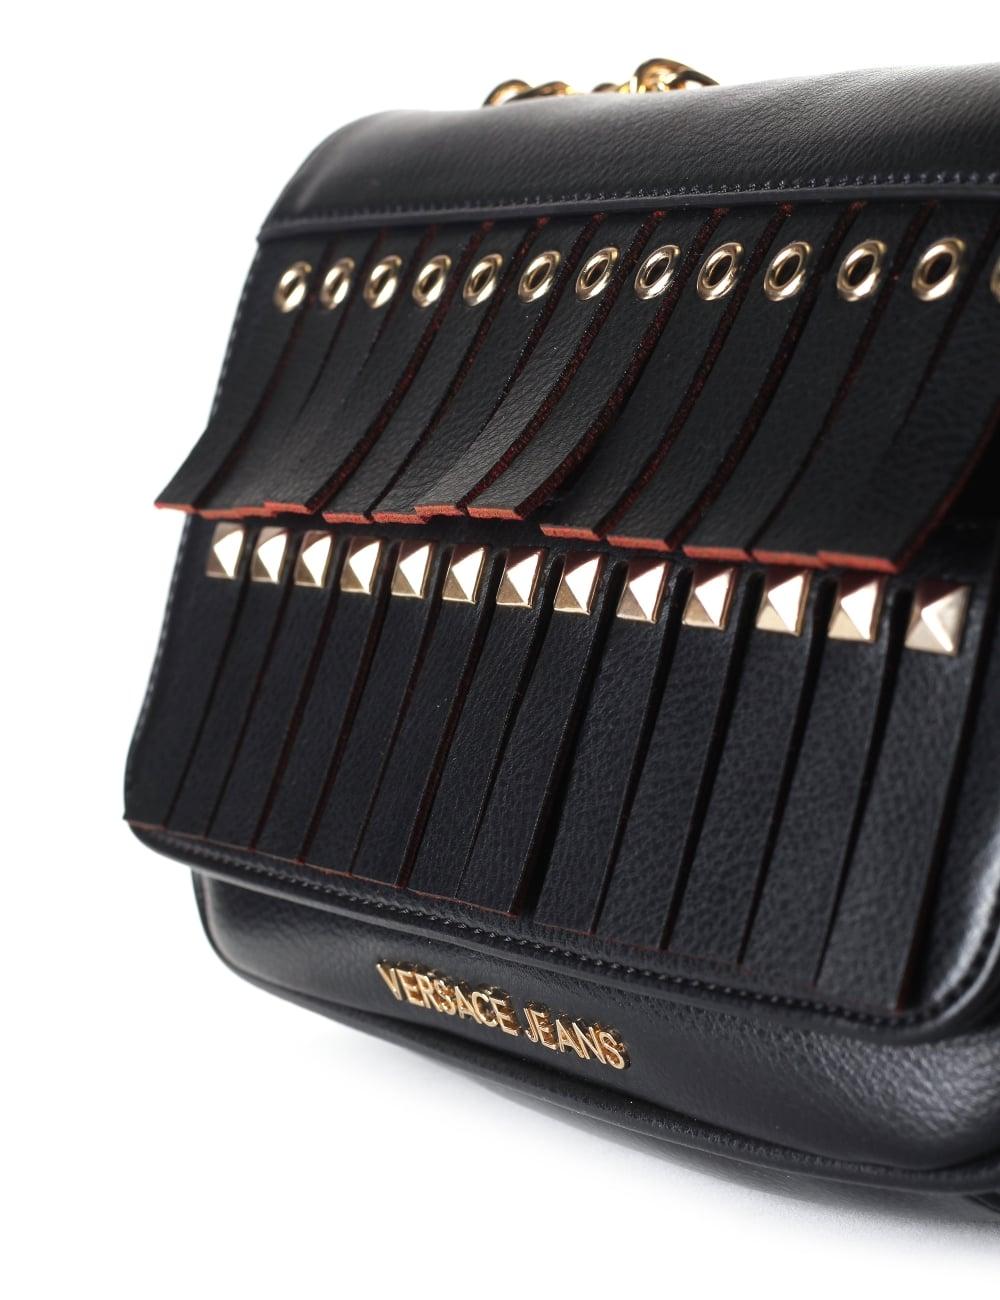 4afd278ae9 Versace Jeans Chain Strap Women s Tassel Crossbody Bag